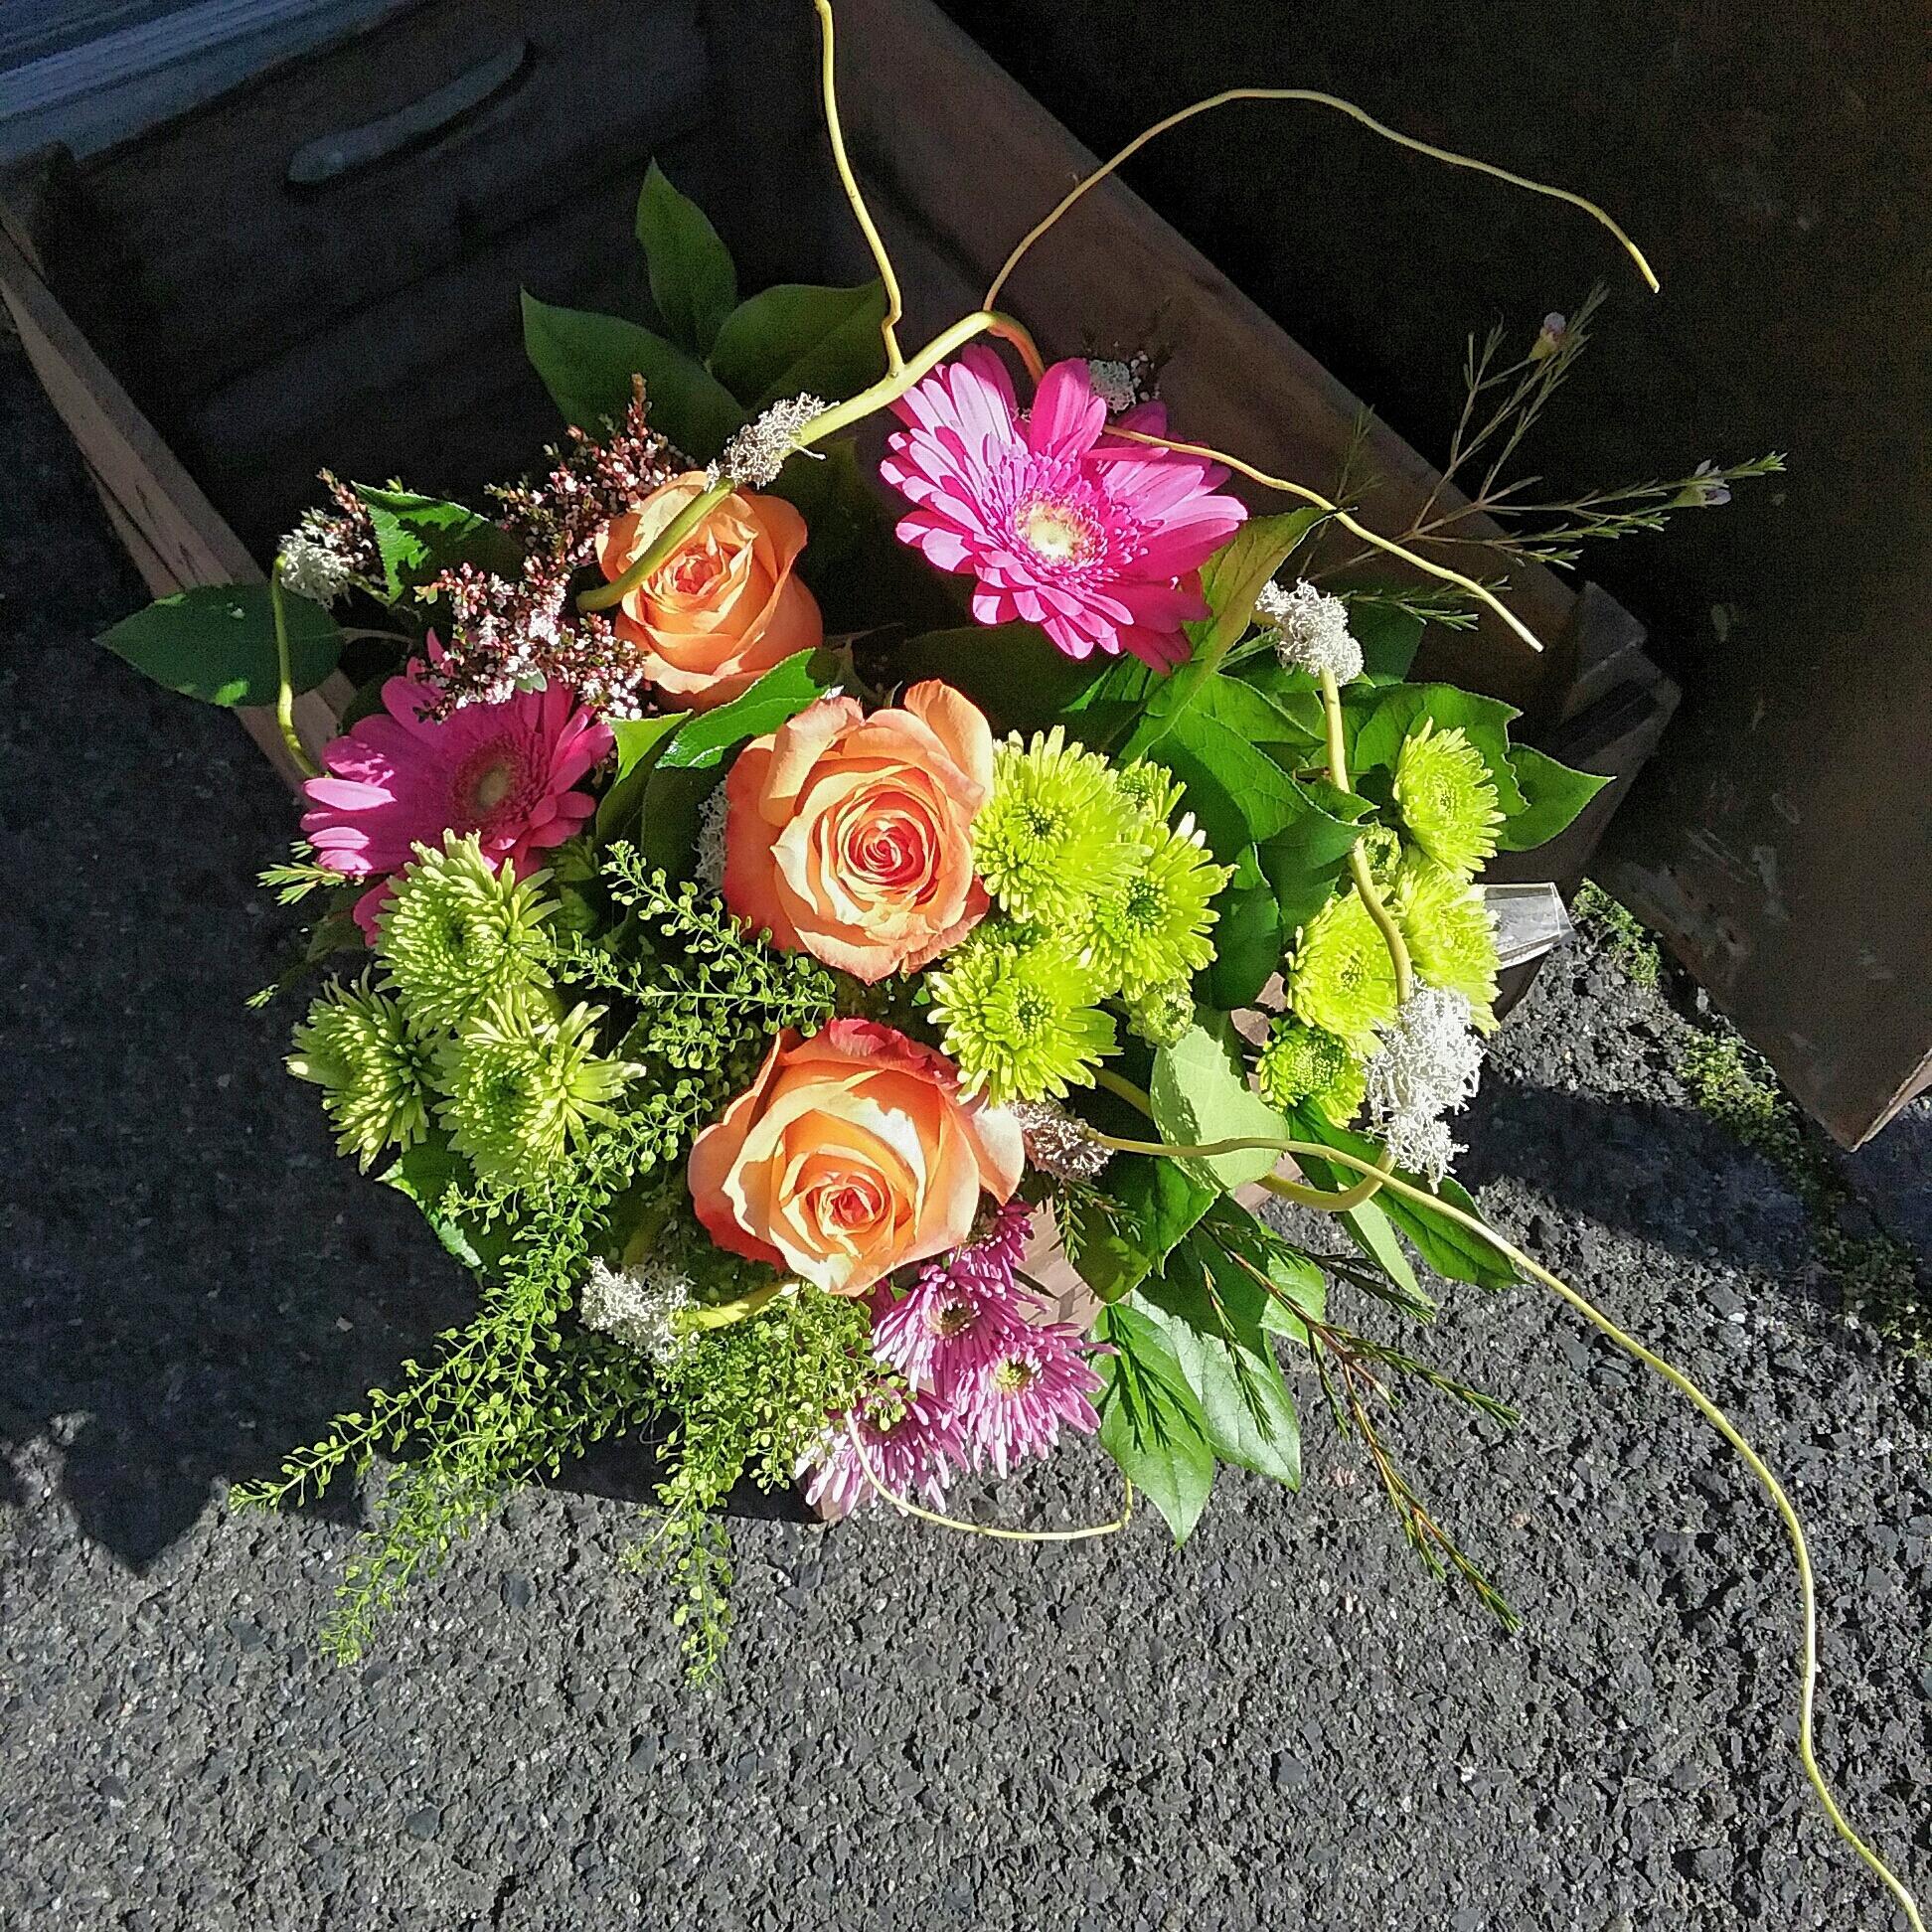 gerbera, roses ,thlaspi ( grasses) and chrysanthemums